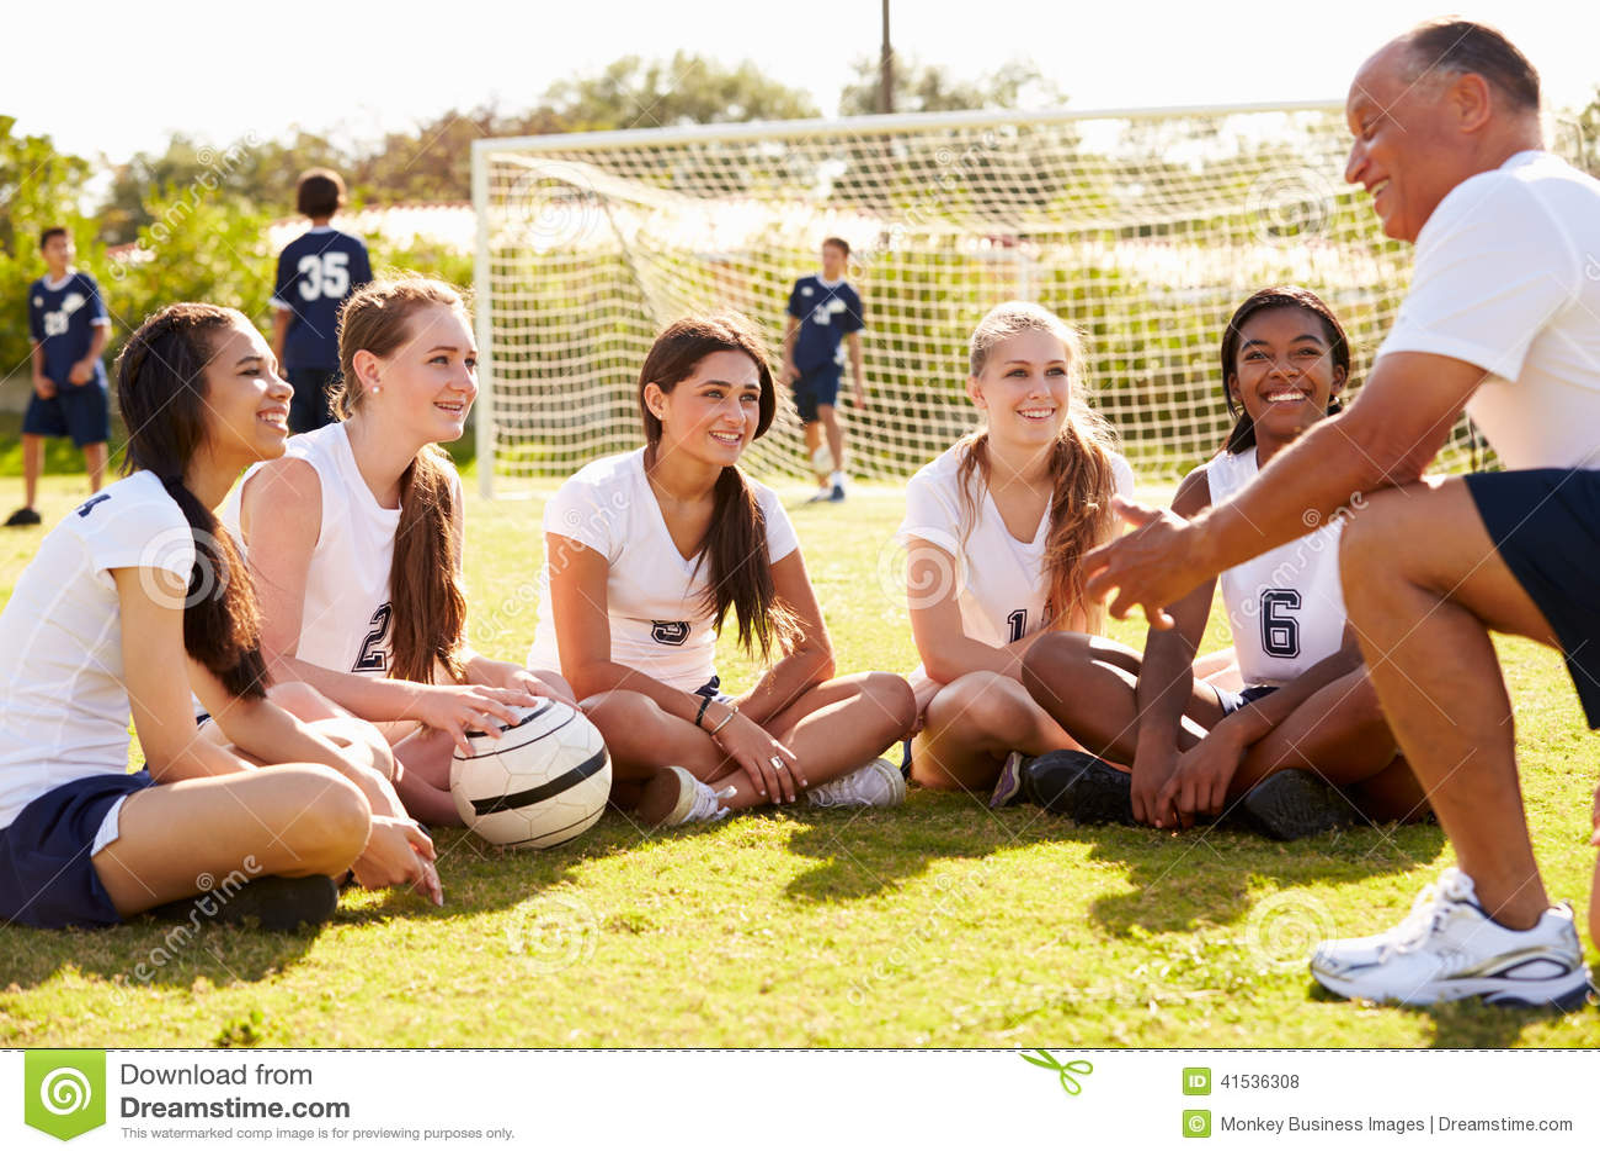 ... Talk To Female High School Soccer Team Stock Photo - Image: 41536308